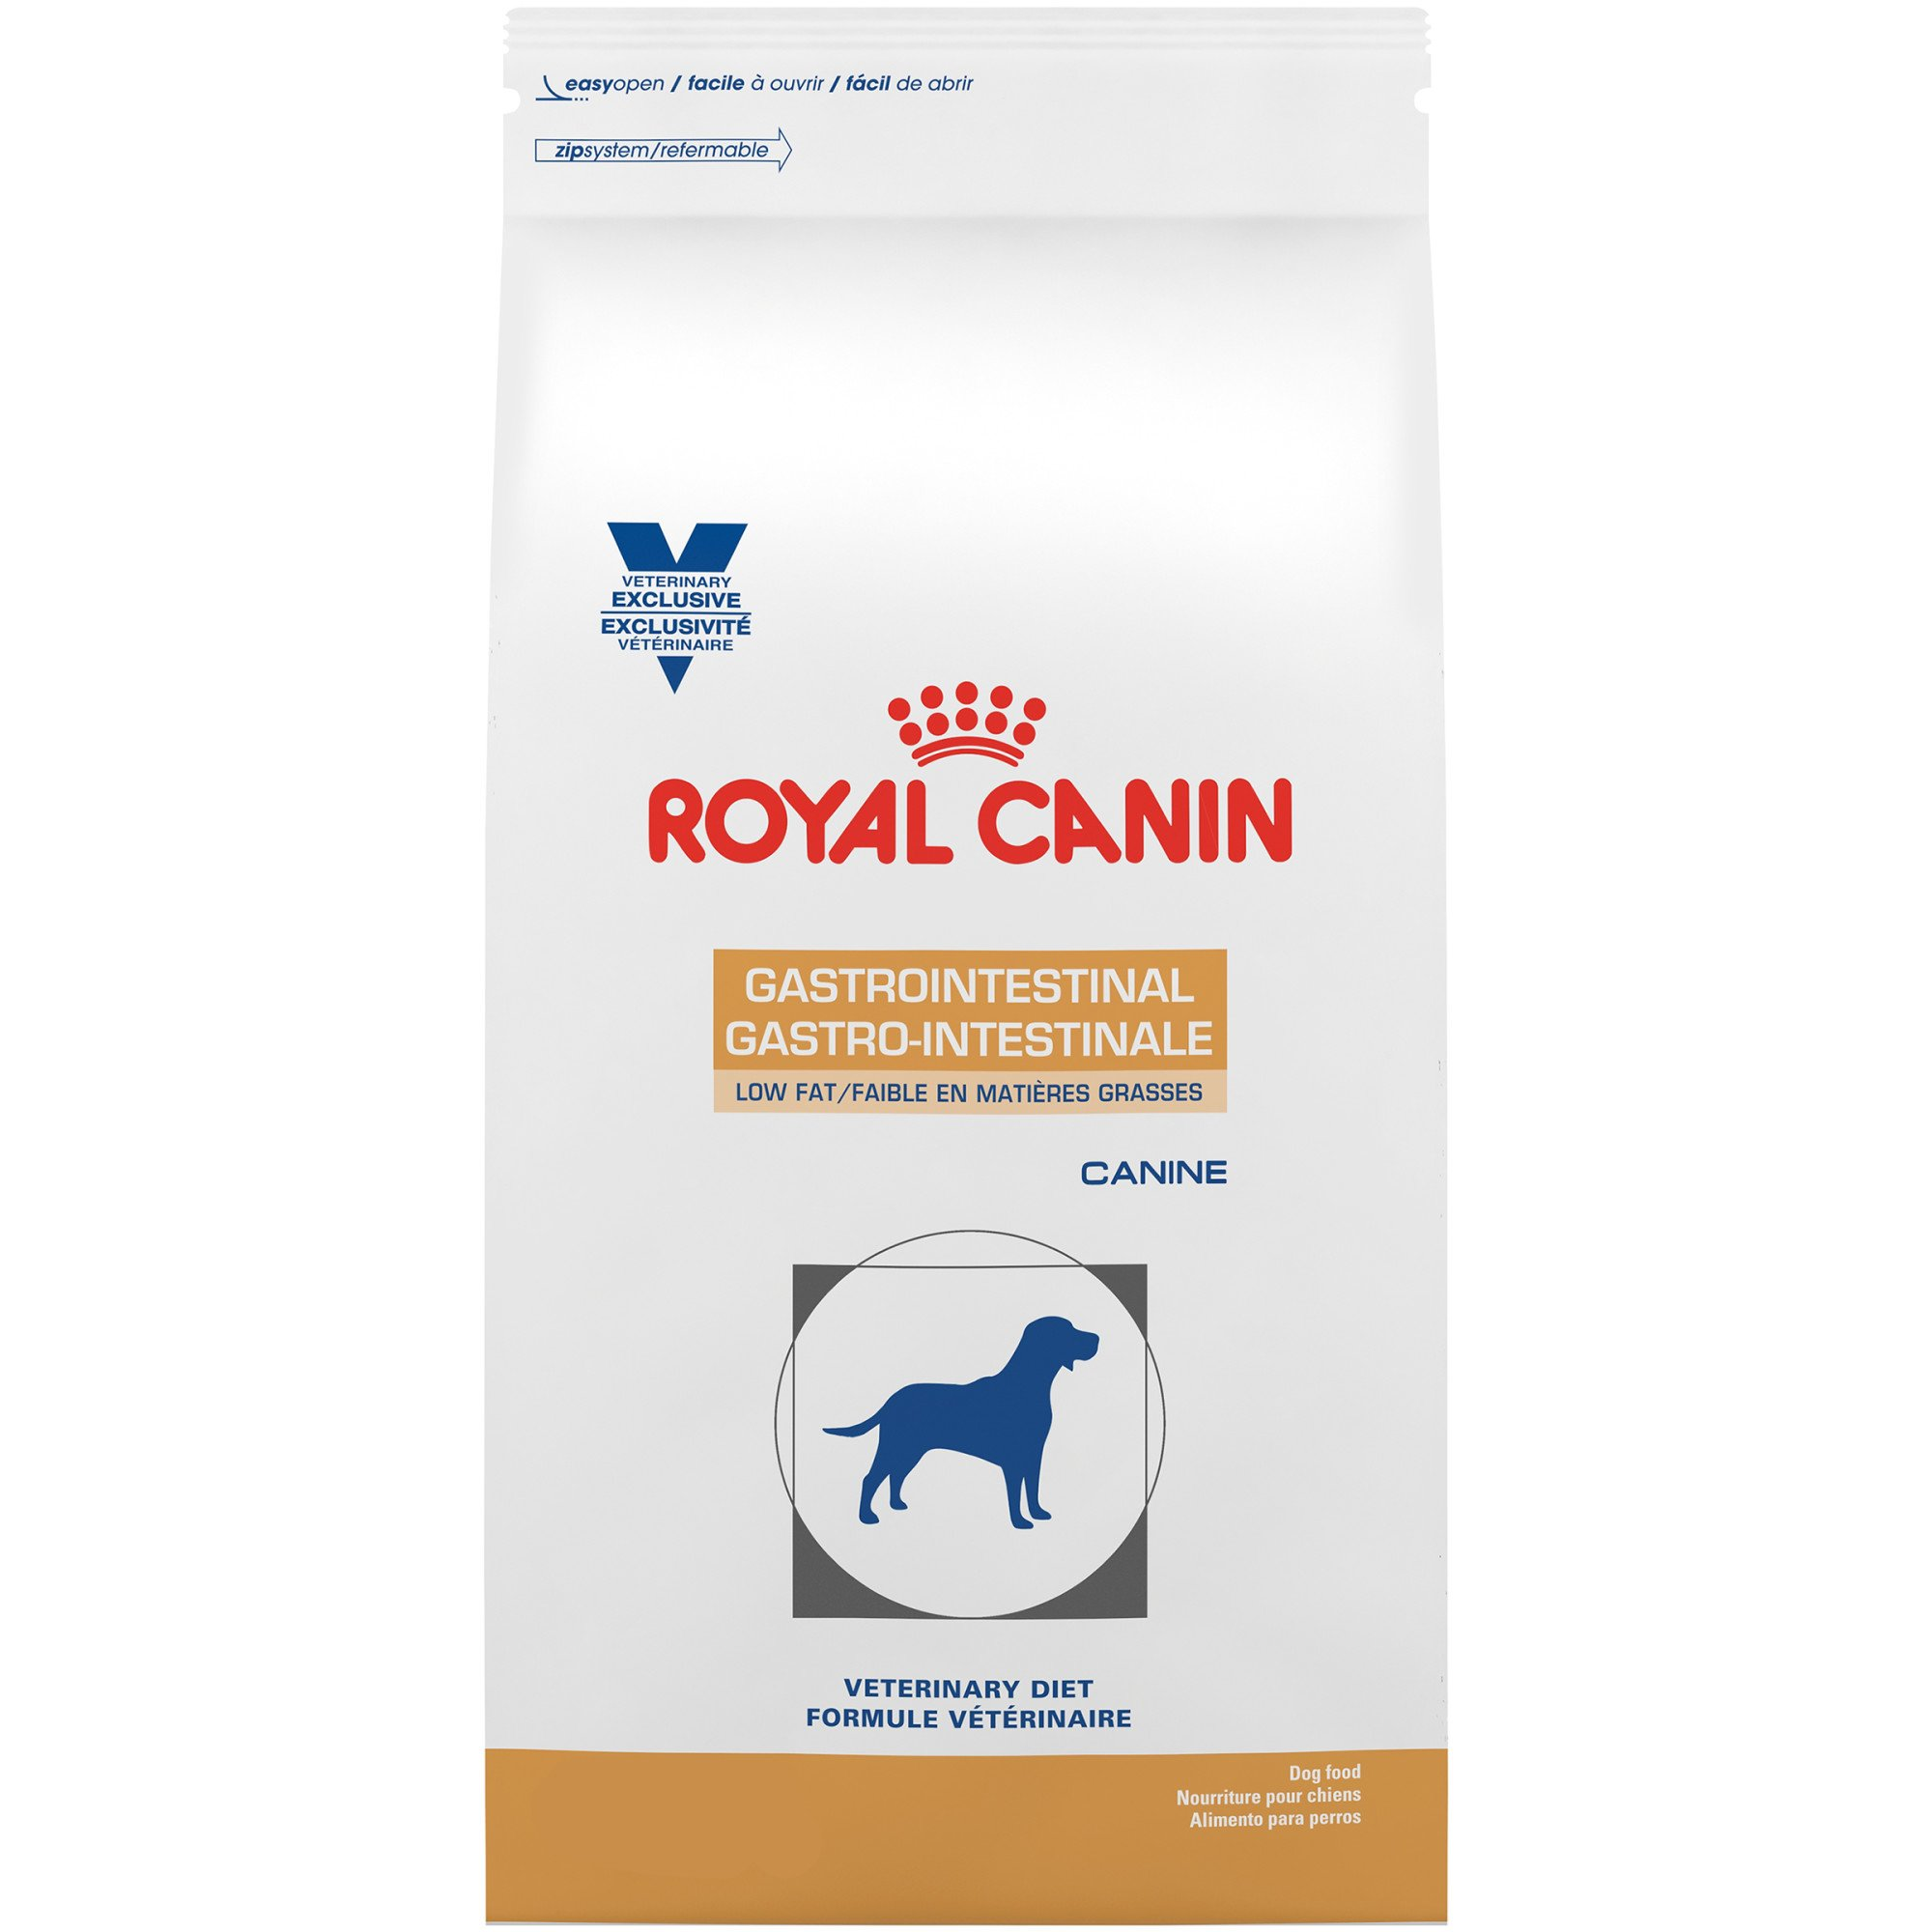 Royal Canin Gastrointestinal Low Fat Dry Dog Food